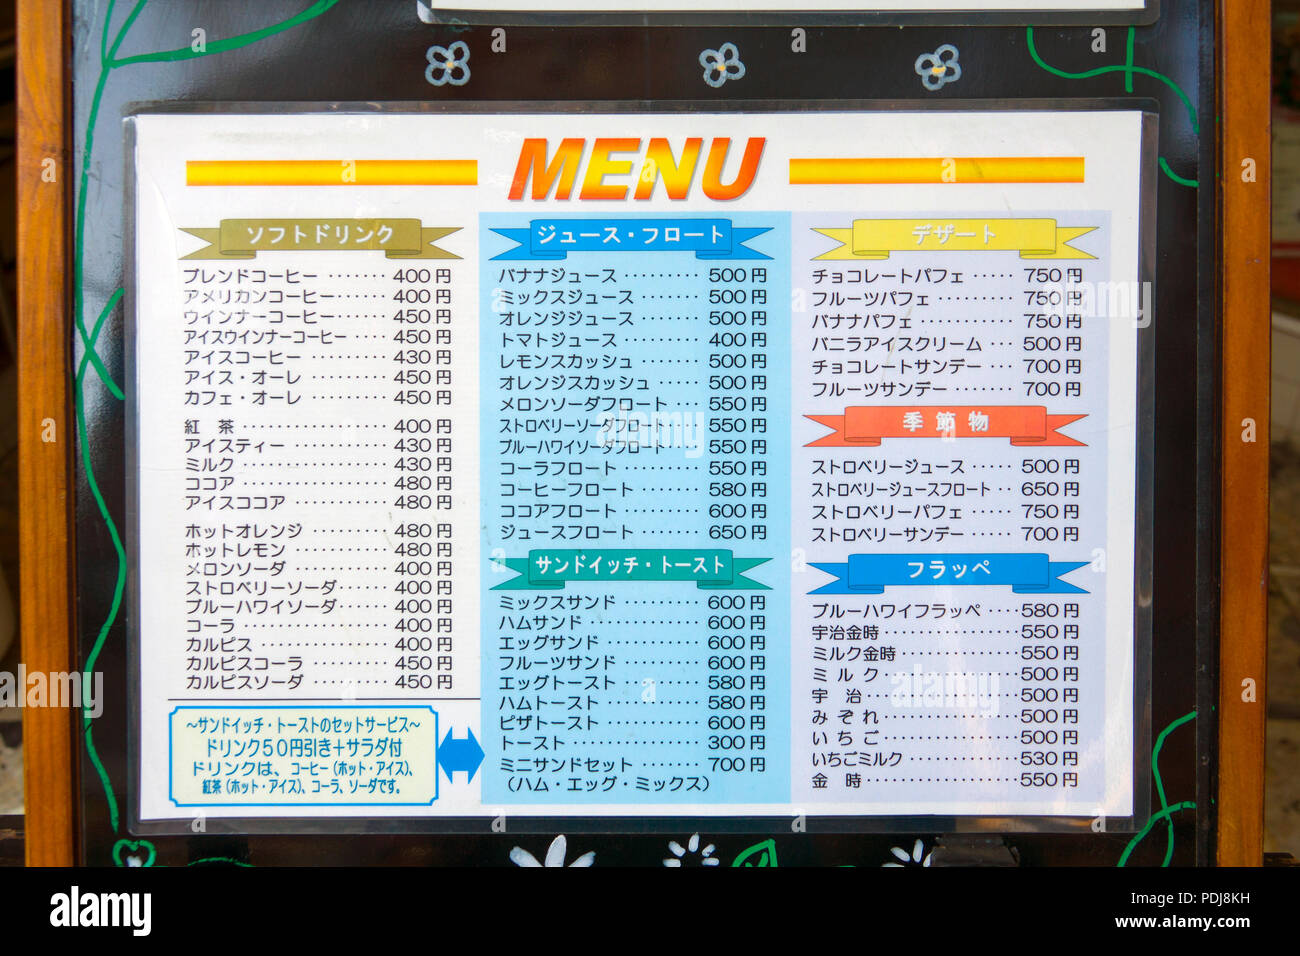 japanese restaurant menu japan asia characters language stock photo